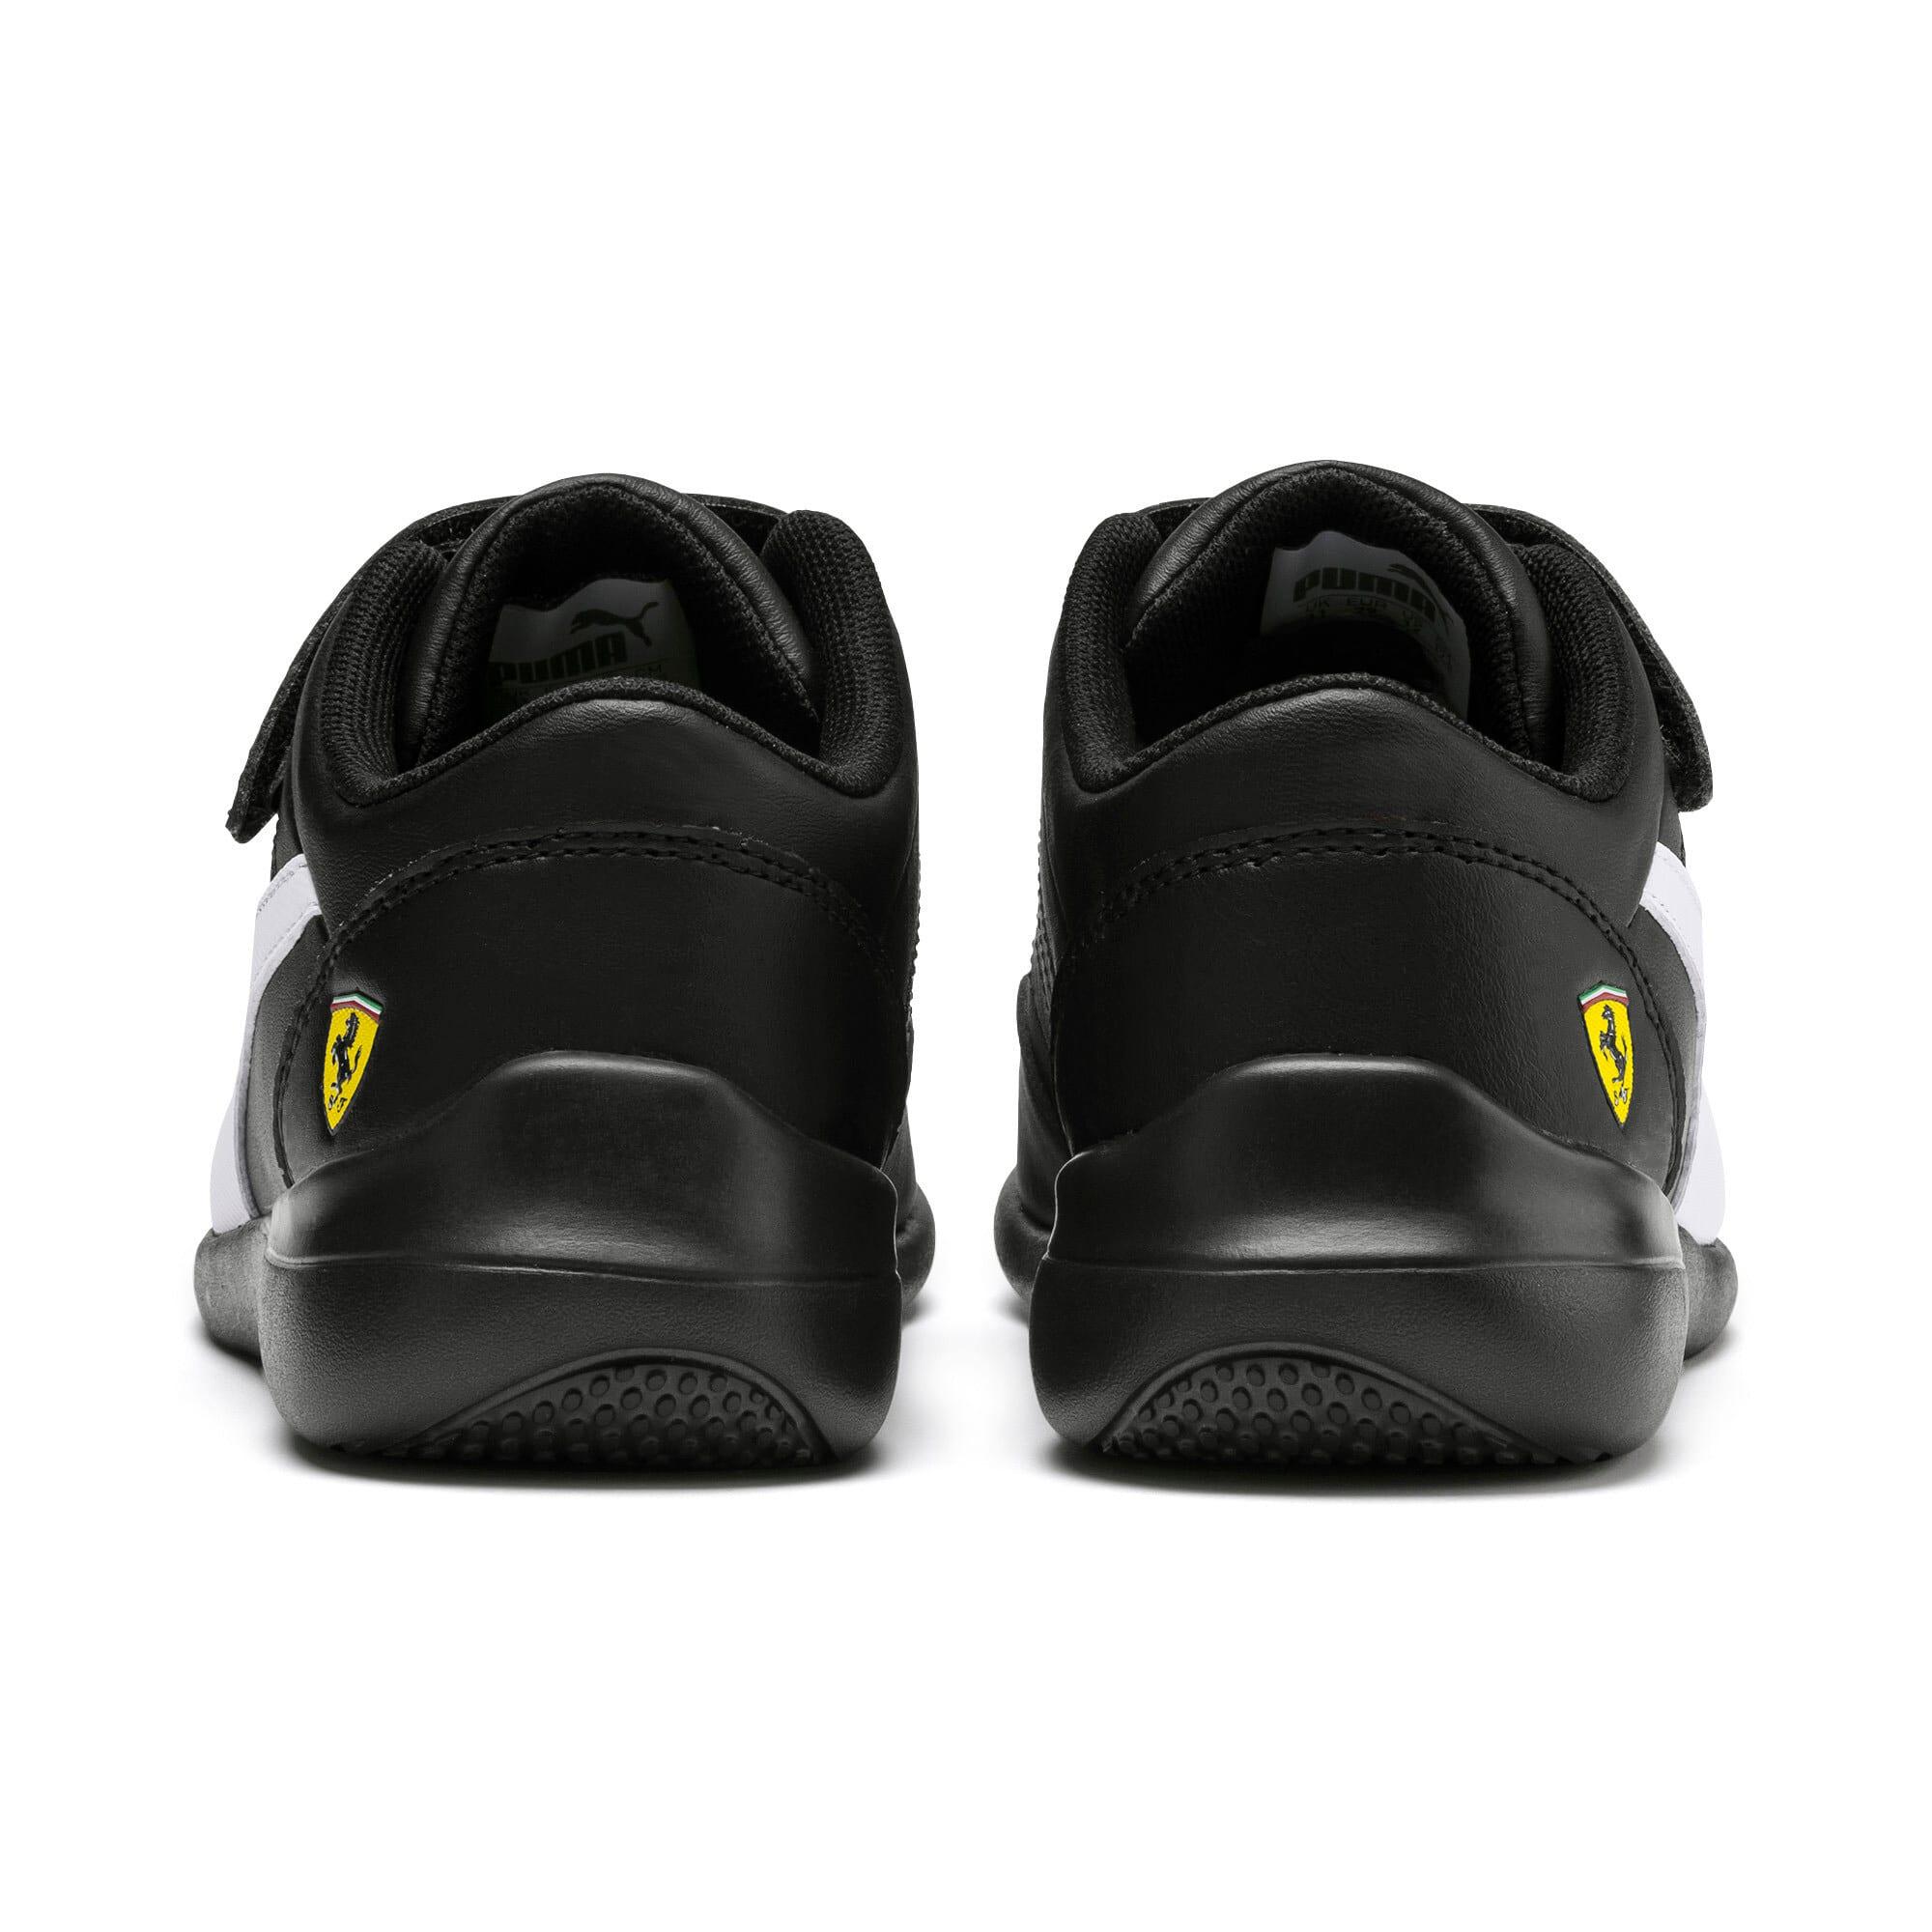 Thumbnail 3 of Scuderia Ferrari Kart Cat III Little Kids' Shoes, Black-White-Blazing Yellow, medium